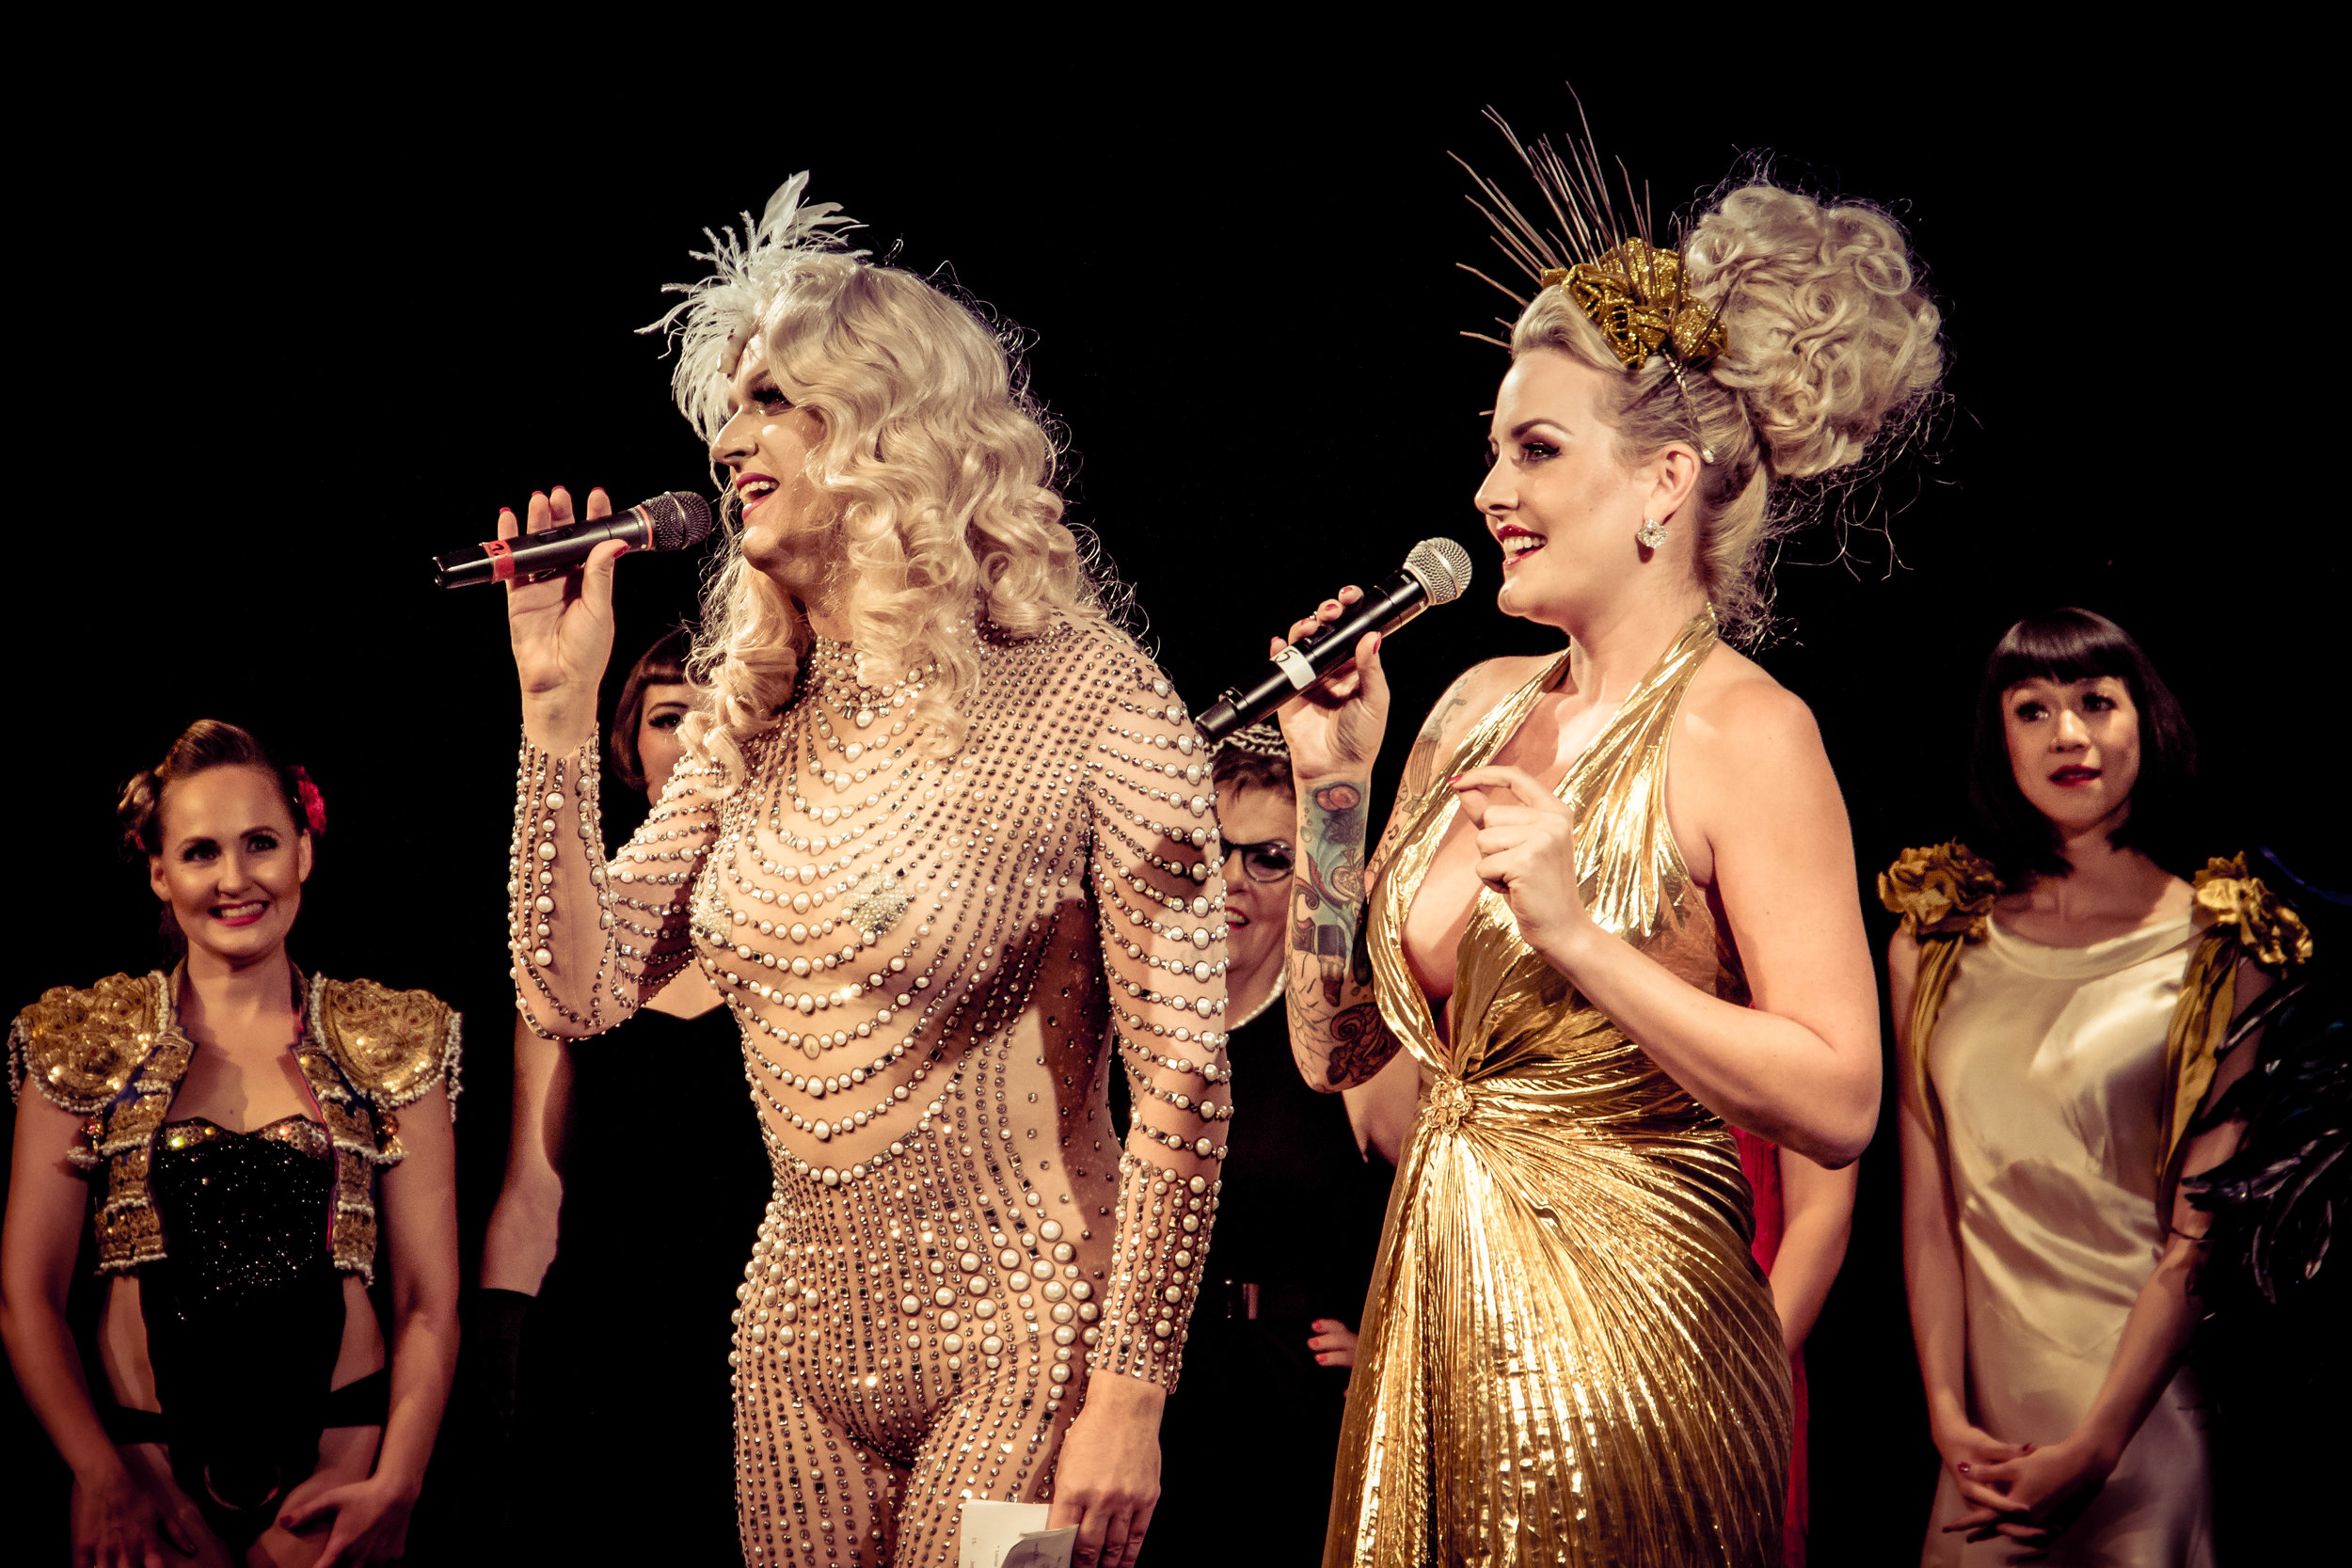 Swiss Burlesque Festival 2018 by Dirk Behlau-4178.jpg